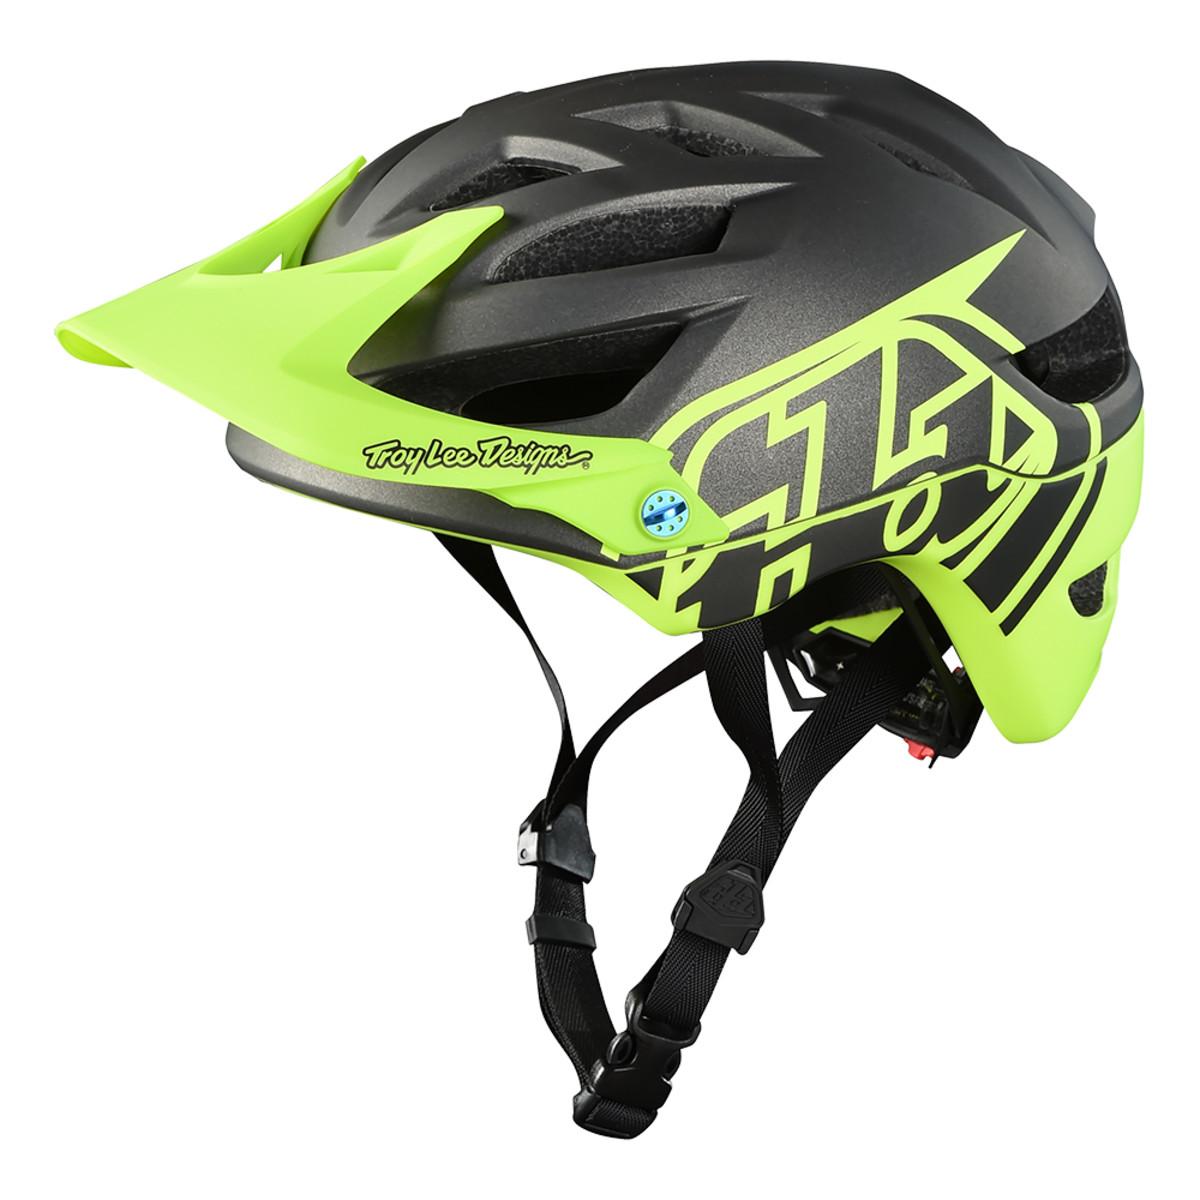 Best Bike Helmets 2020.Helmets The Bike Dads